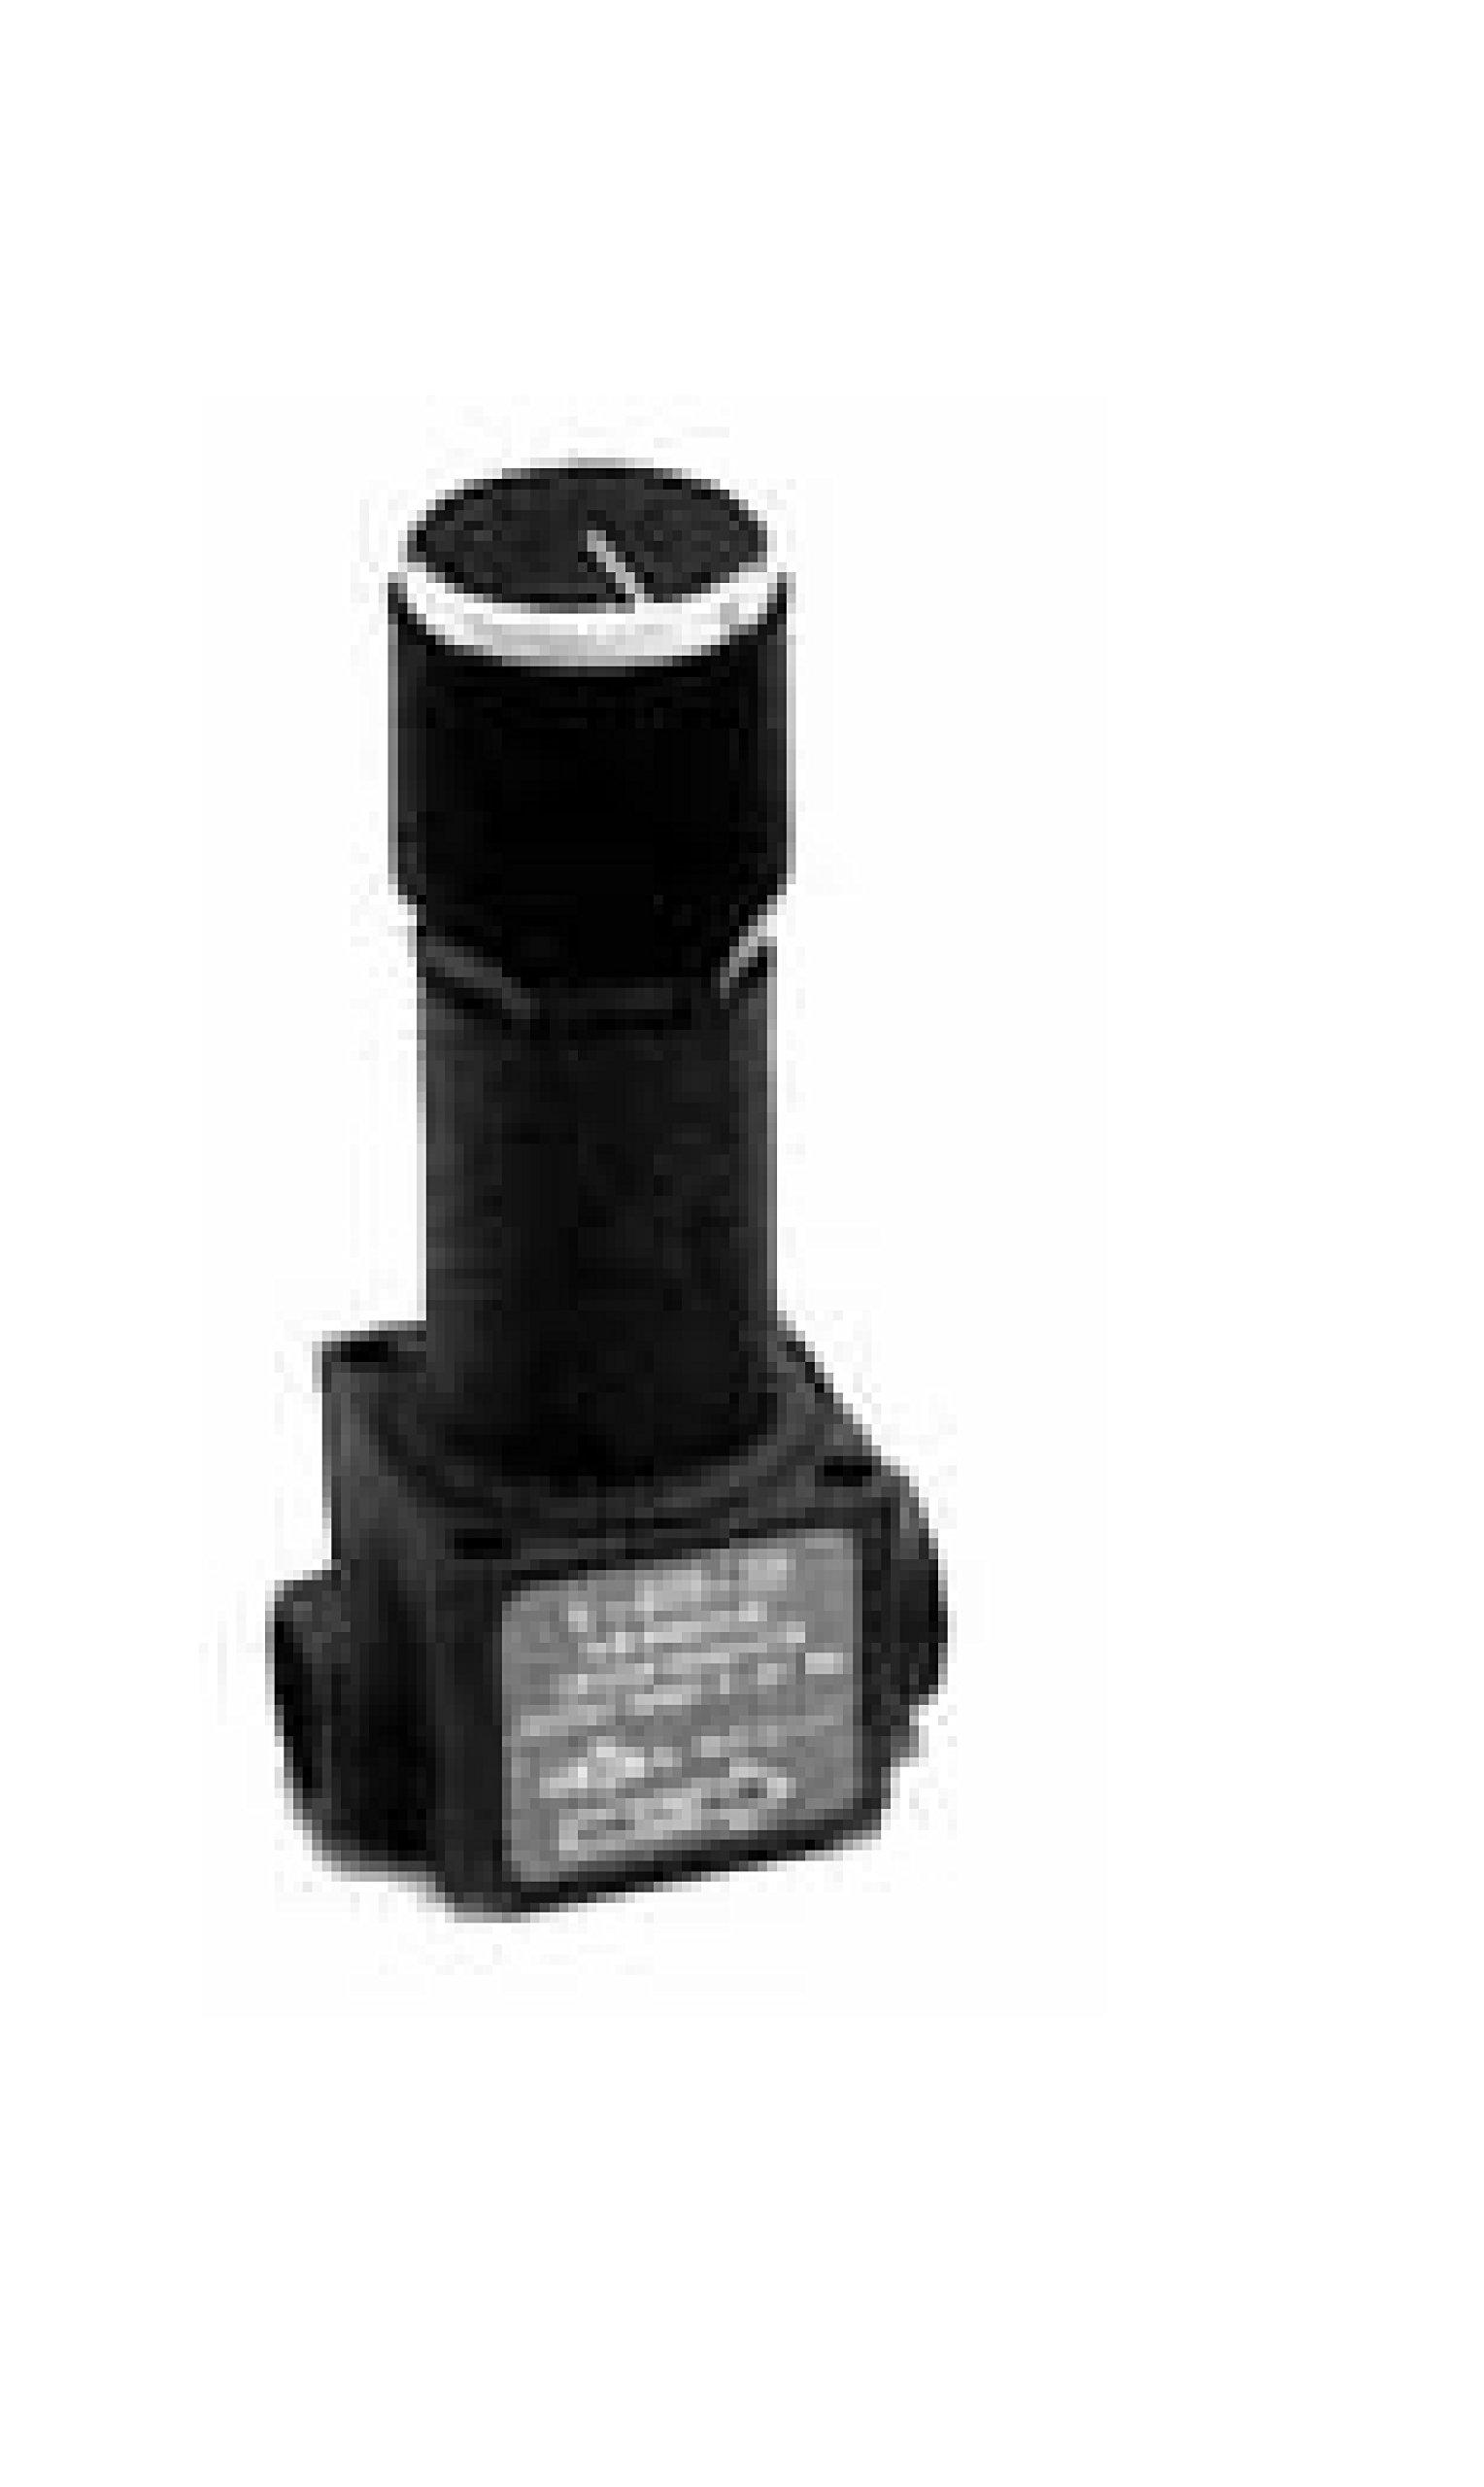 Airtrol Miniature Precision Vacuum Regulator V-800-30 W/K, 0-30Hg w/adjustable knob